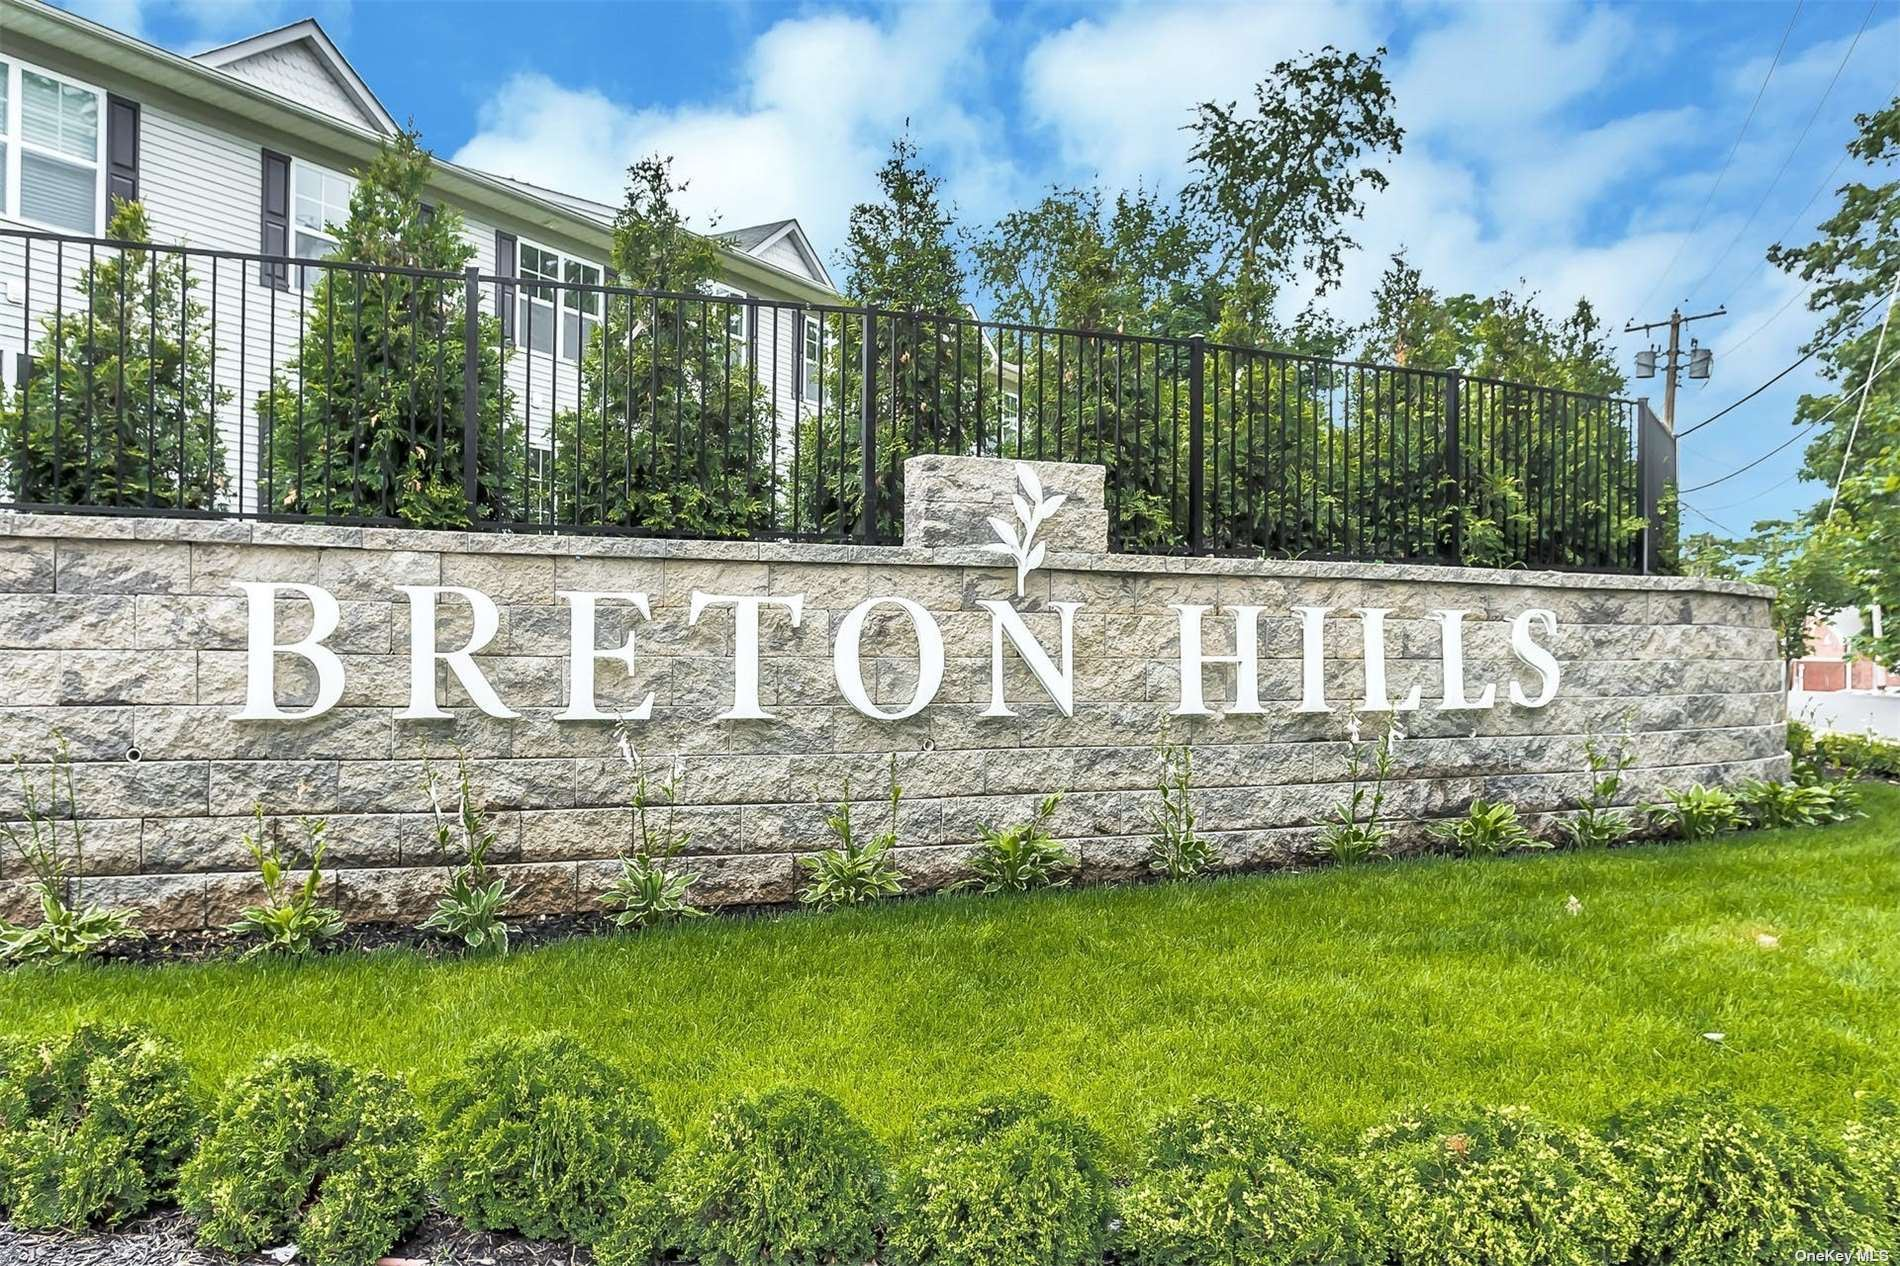 411 Breton Way #lower, Glen Cove, NY 11542 - MLS#: 3325874